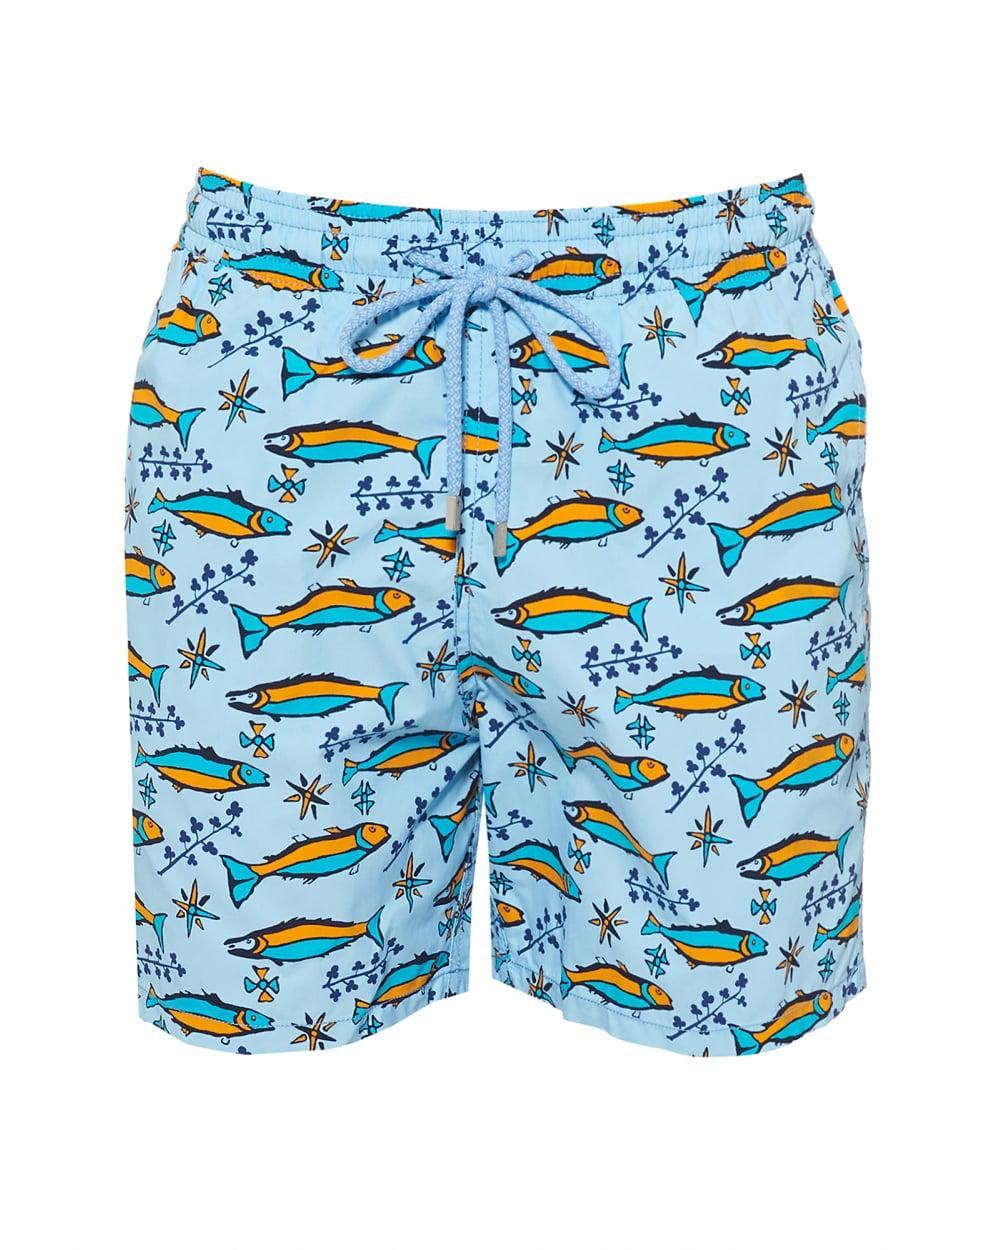 035aca4a0c Vilebrequin. Men's Moorea Swimshort, Sky Blue Sardine Print Swimming Trunks